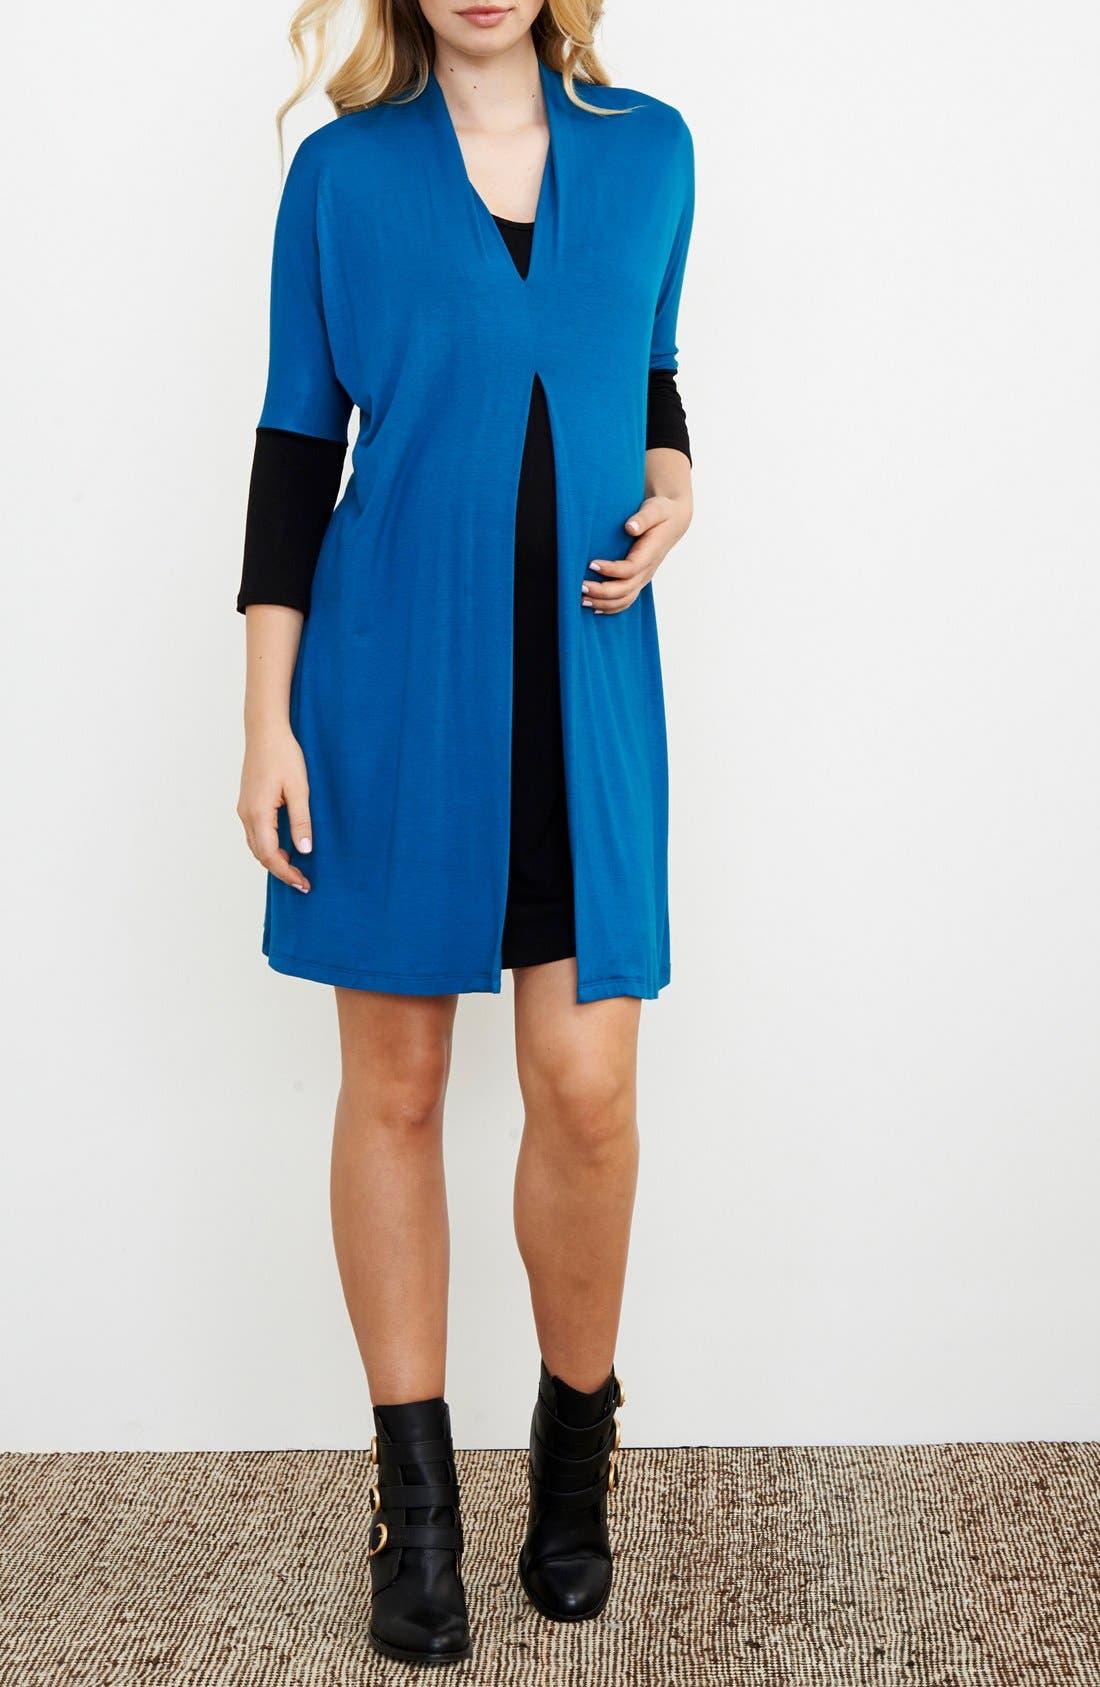 MATERNAL AMERICA Layered Maternity/Nursing Dress